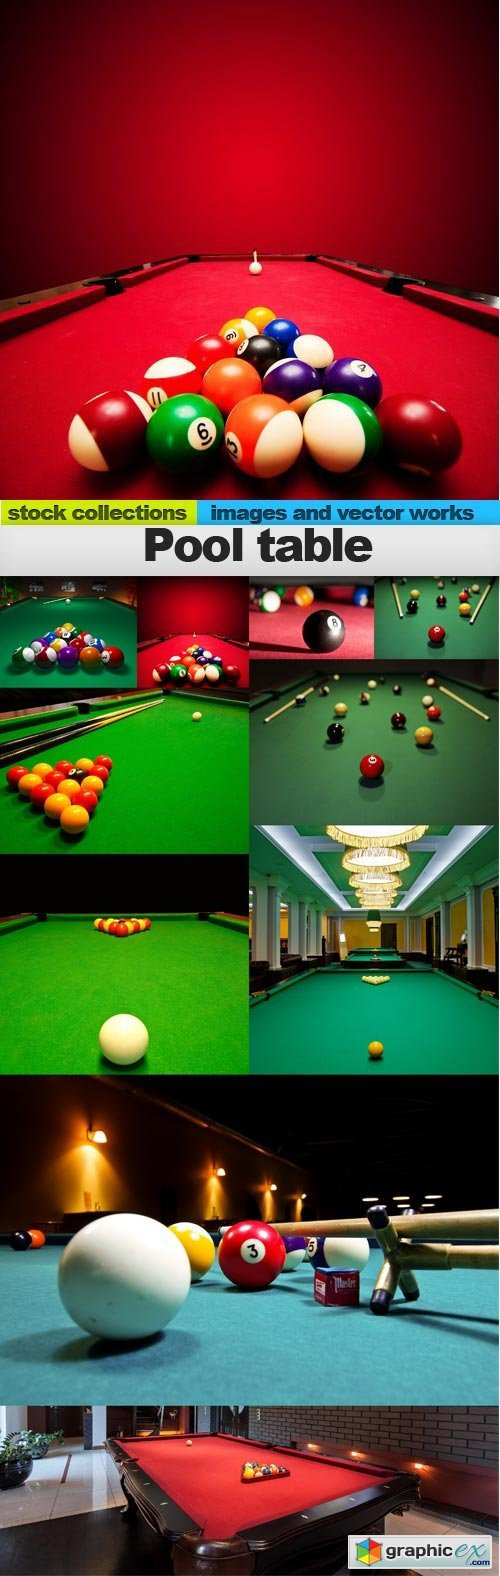 Pool table, 10 x UHQ JPEG